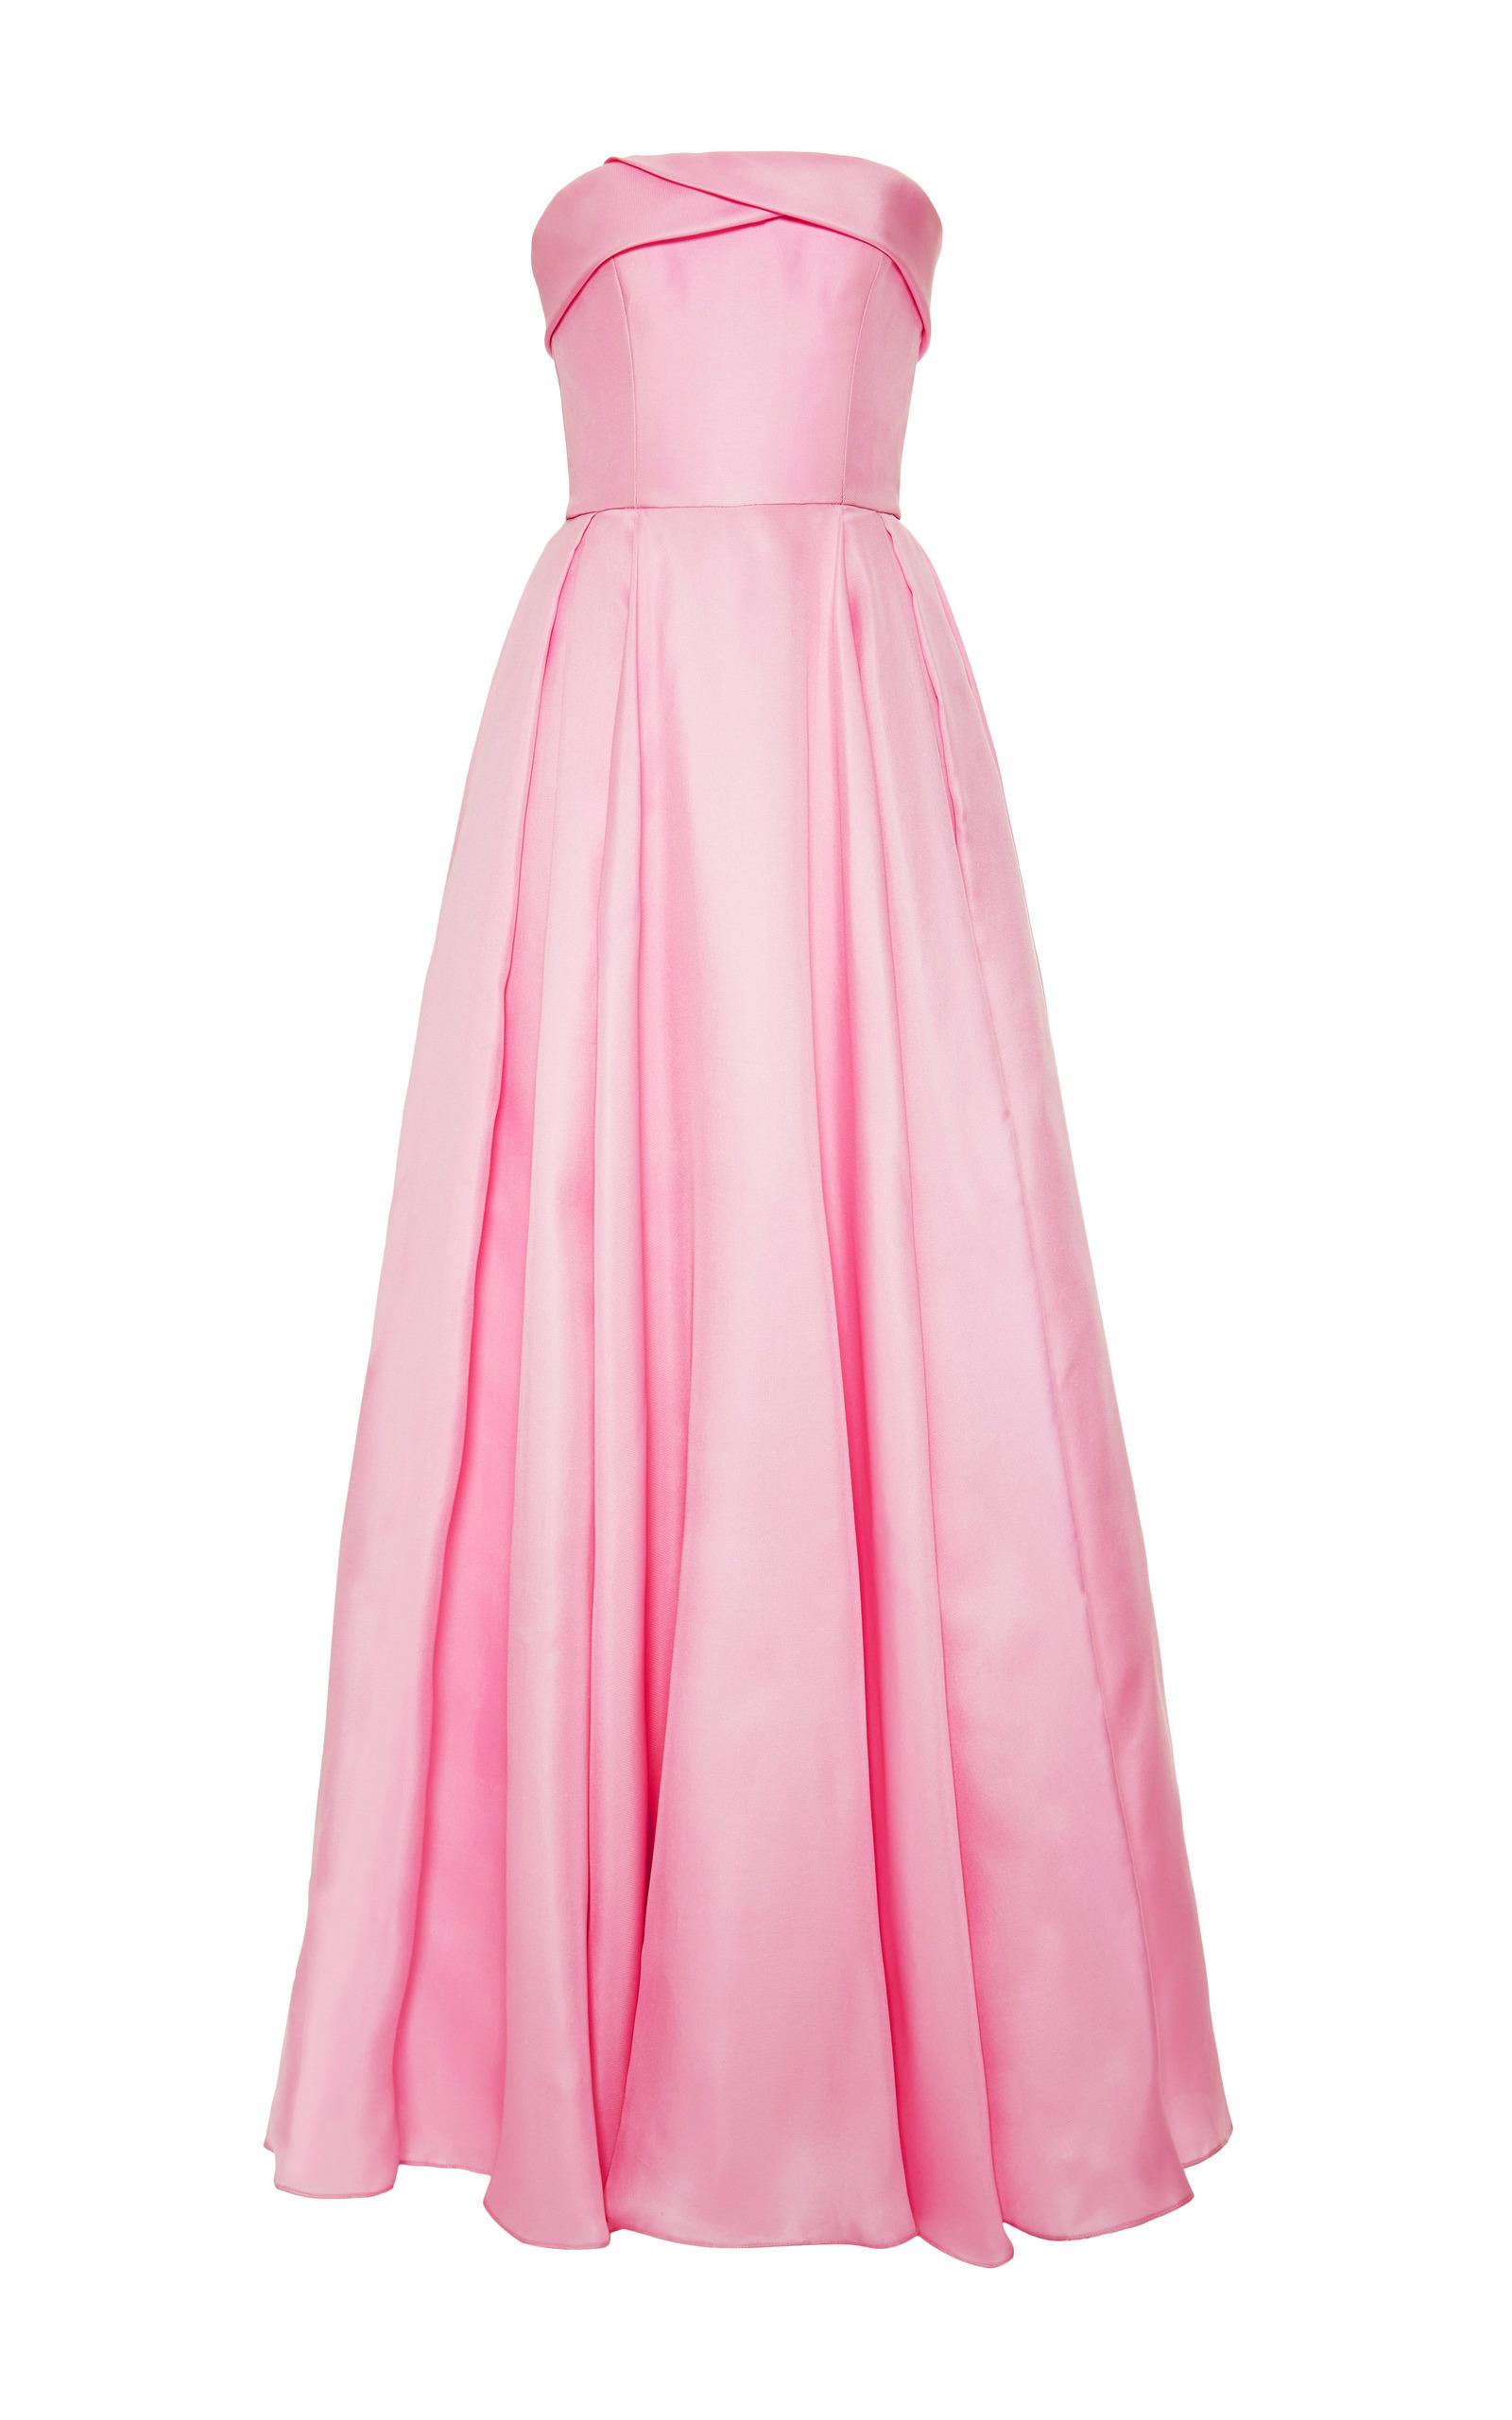 3a391c995a Reem AcraReem Acra Strapless Silk Gazar Pleated Ball Gown. CLOSE. Loading.  Loading